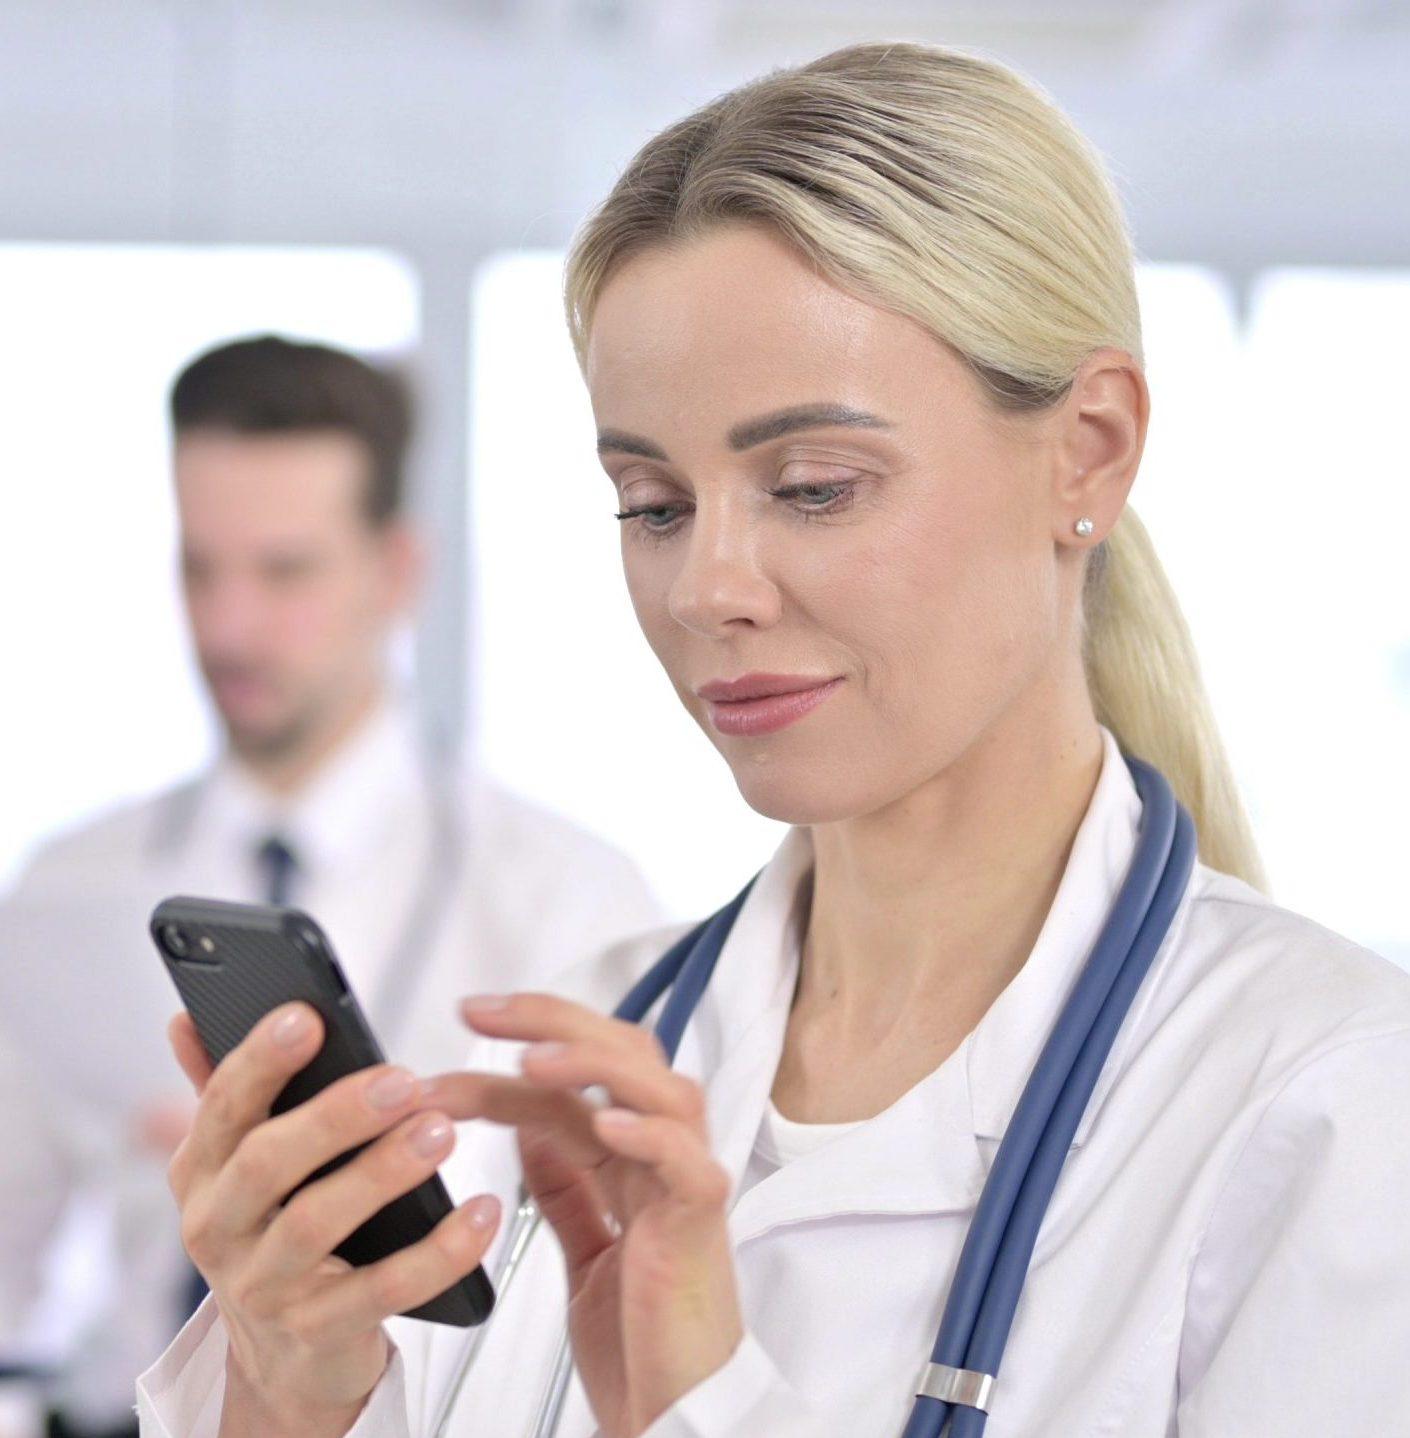 Focused female doctor using Smartphone